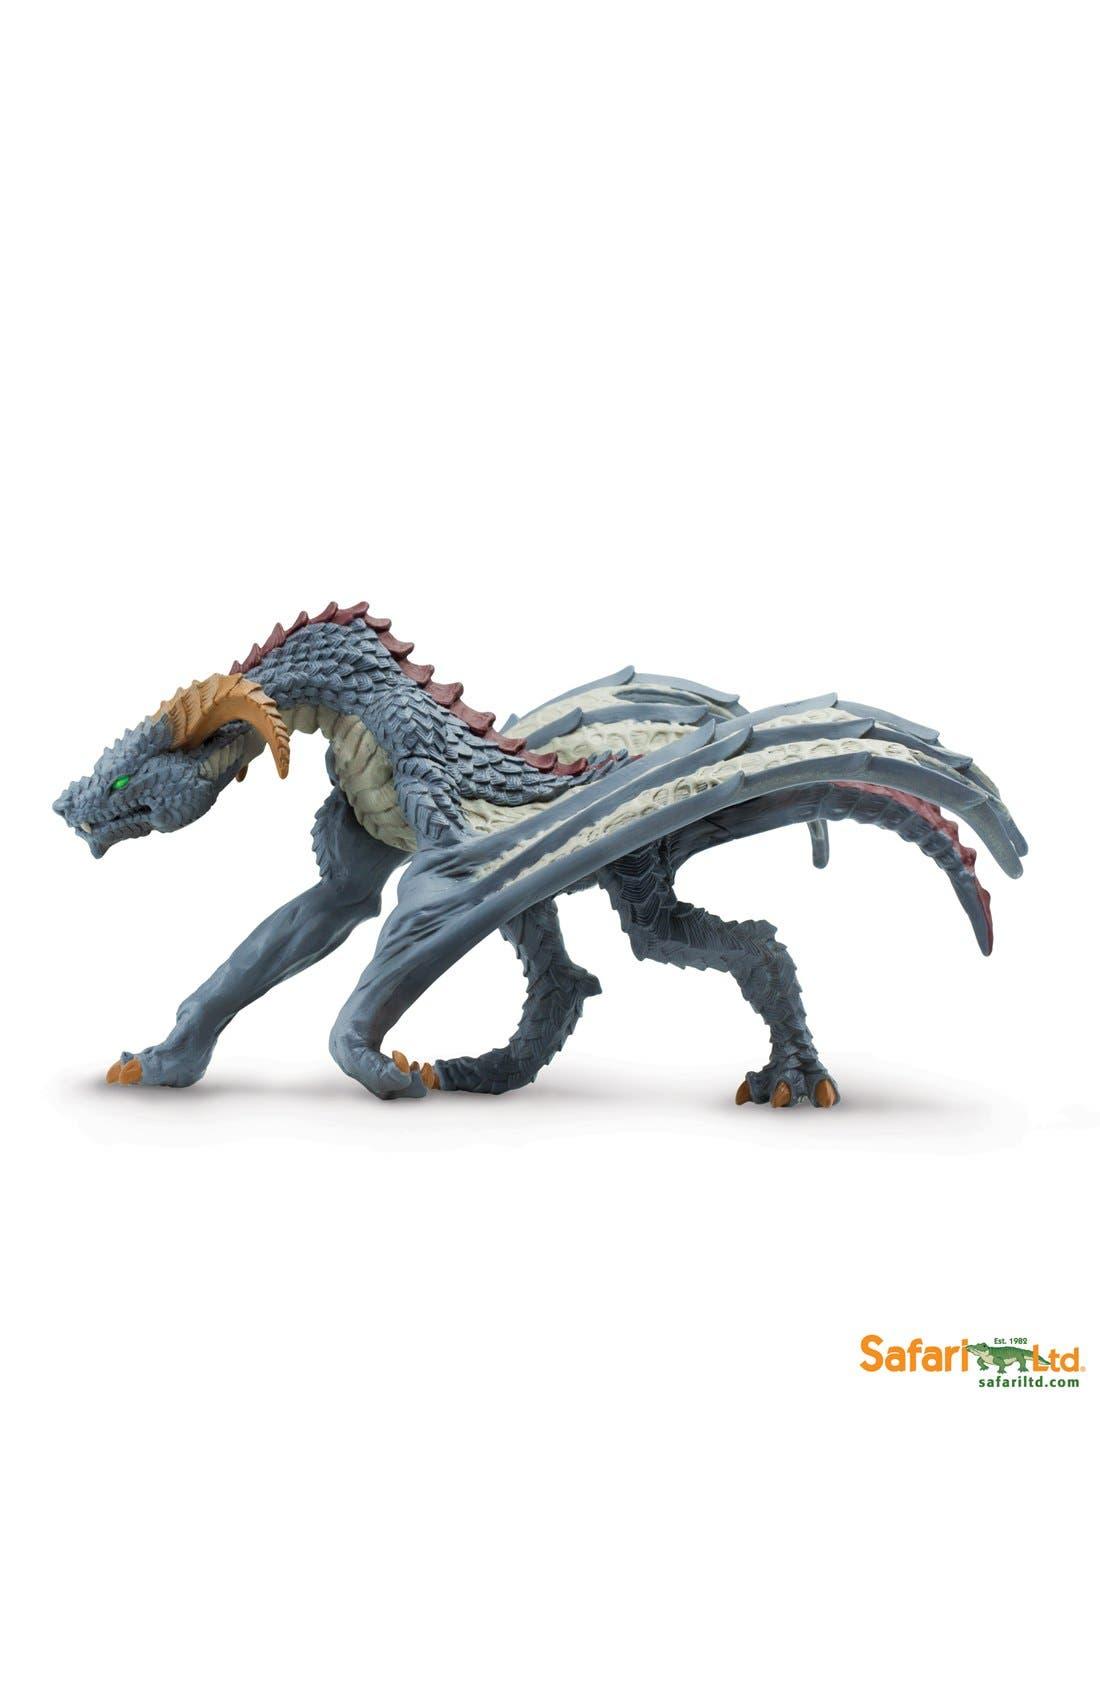 Cave Dragon Figurine,                             Main thumbnail 1, color,                             CAVE DRAGON